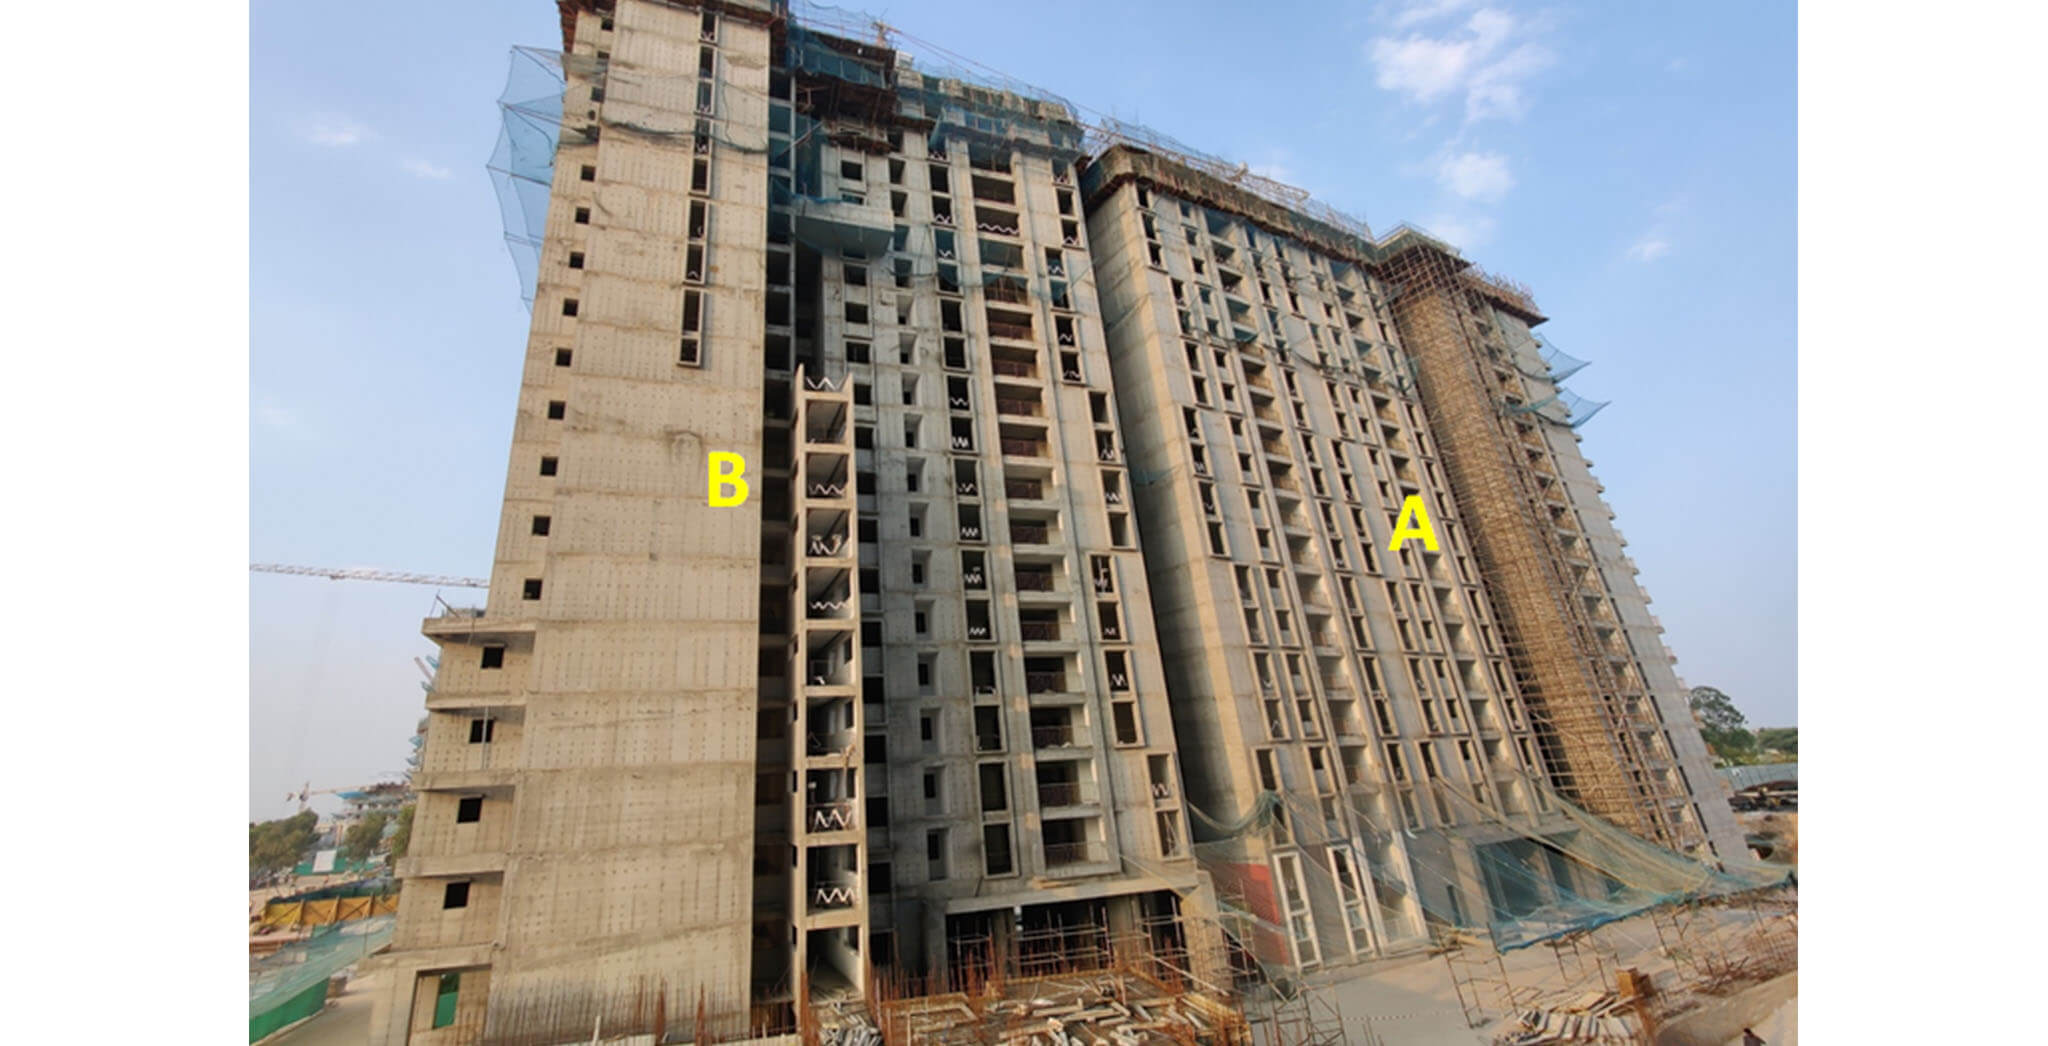 Feb 2021 - Serene: Tower A—21st floor slab structure work-in-progress; Tower B—21st floor slab structure work-in-progress